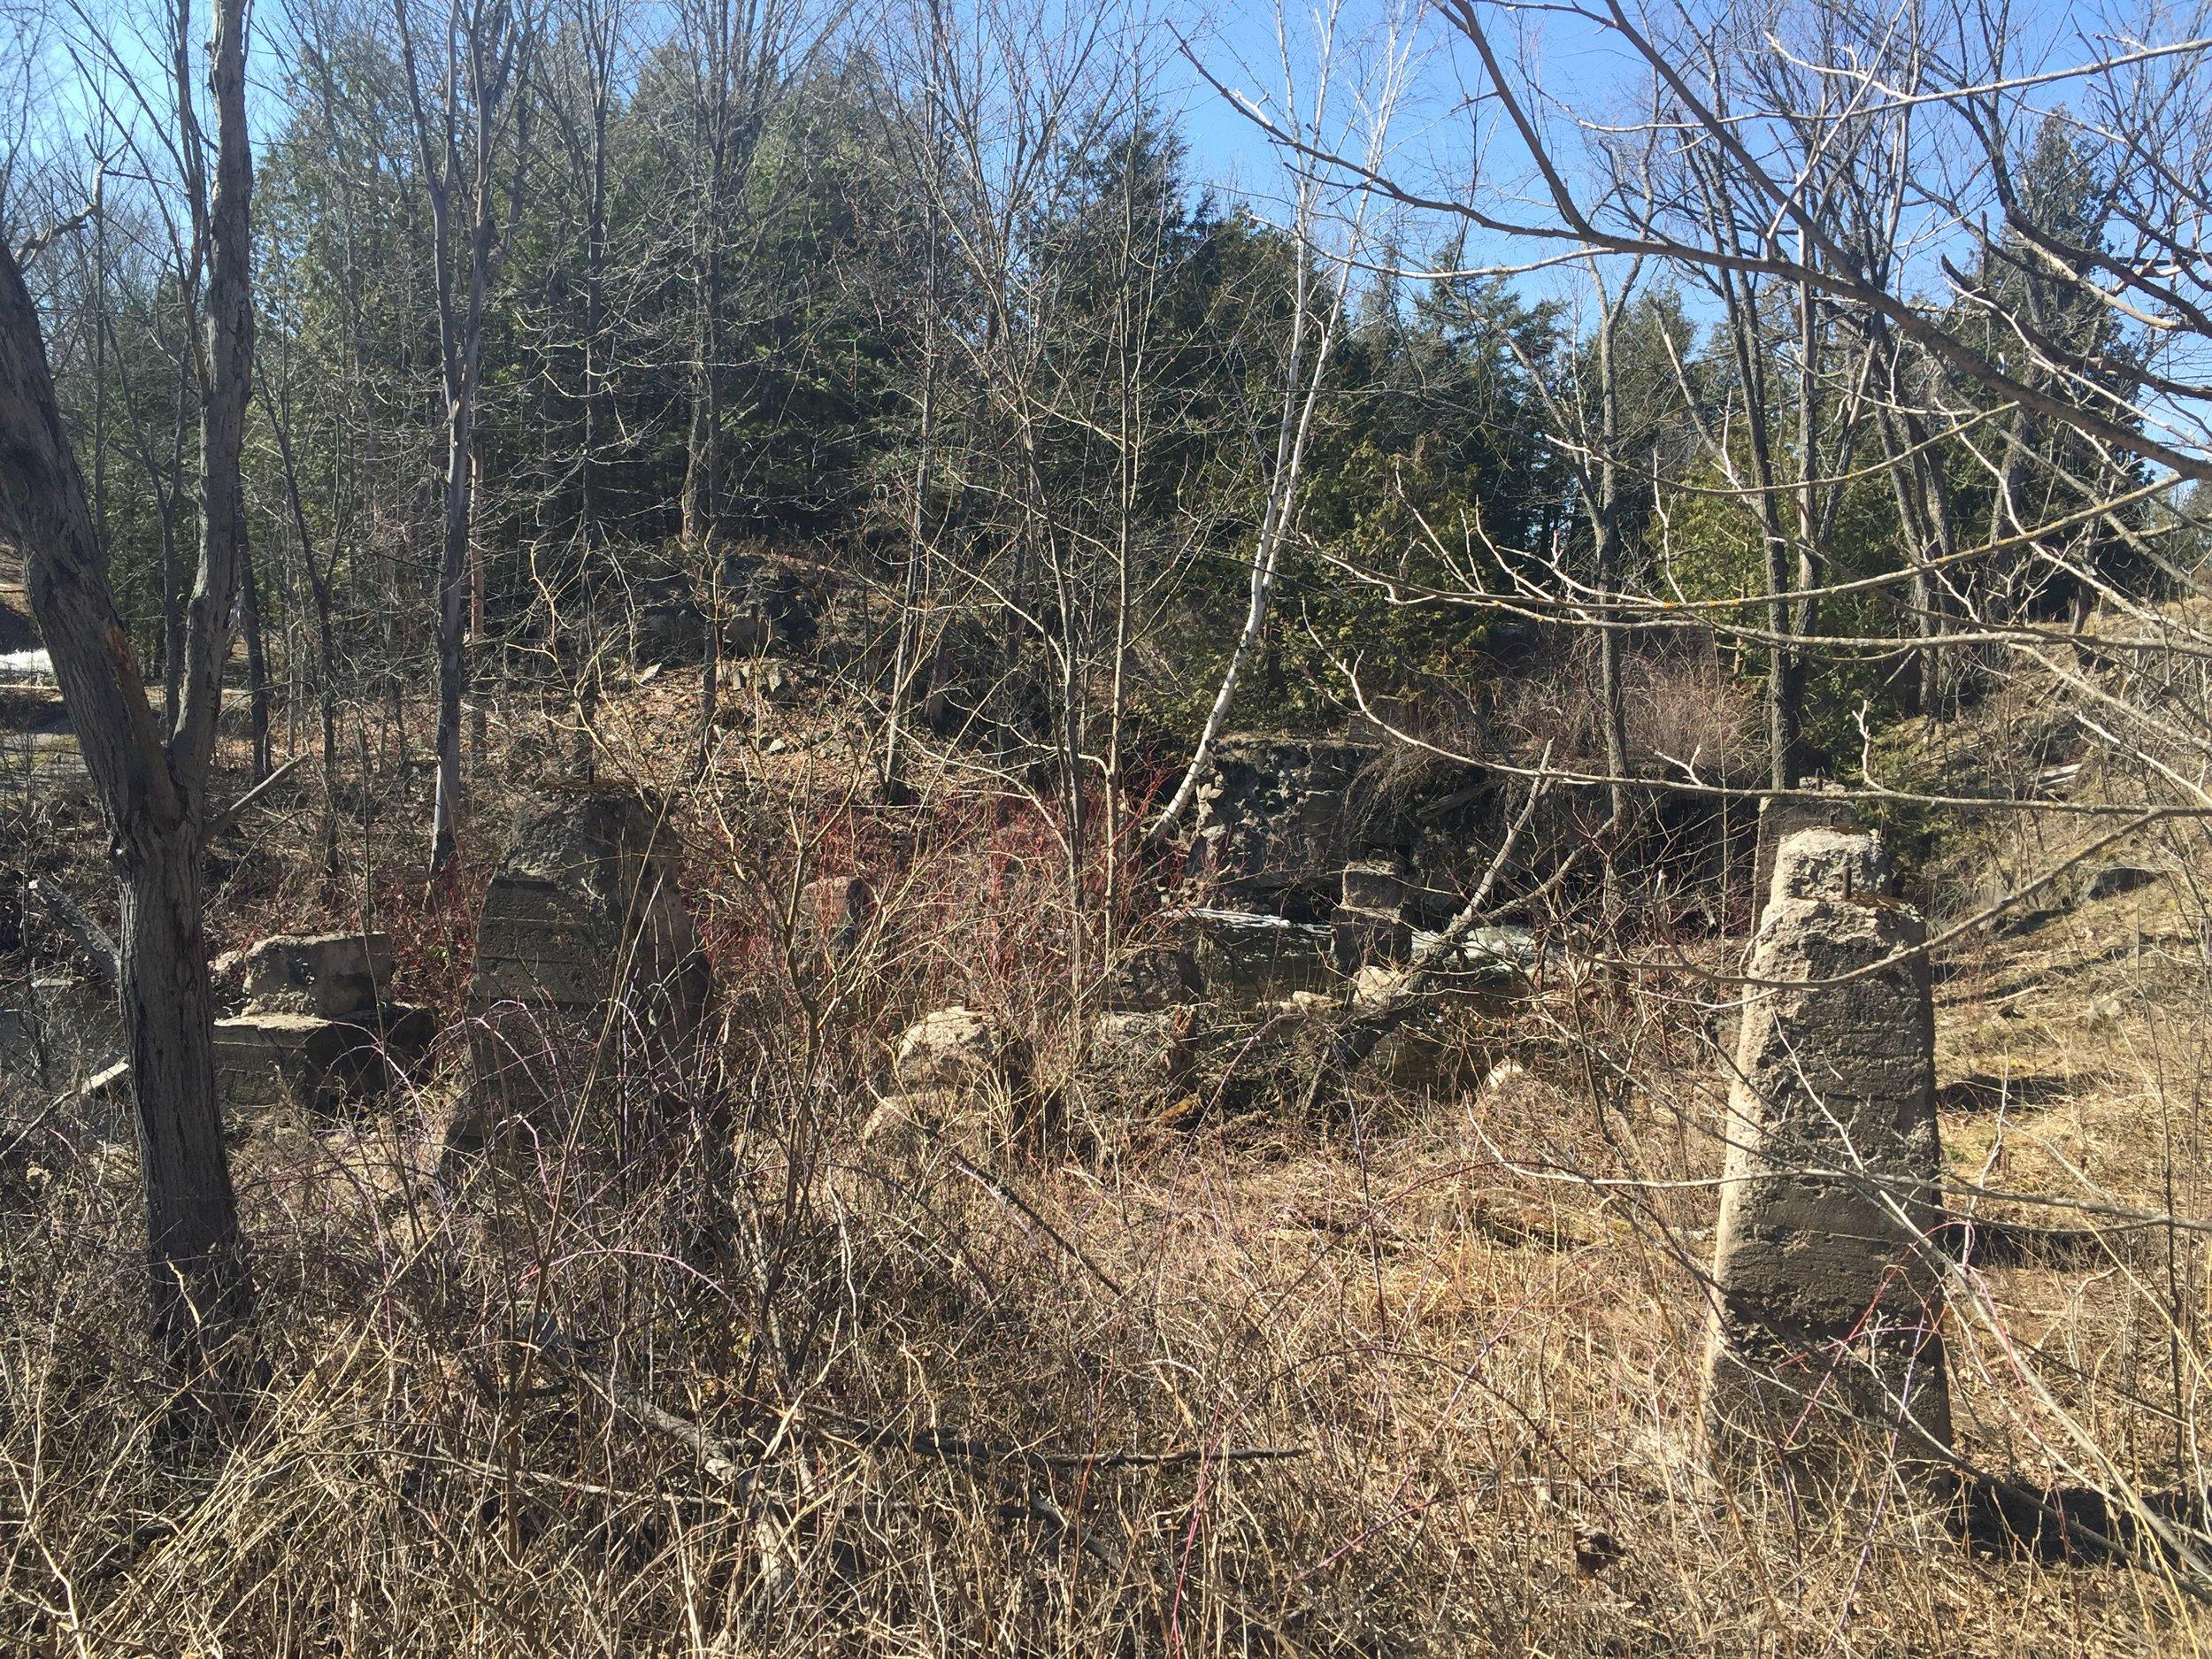 Bonter Saw Mill Lot 19 Conc. 5 (6).JPG